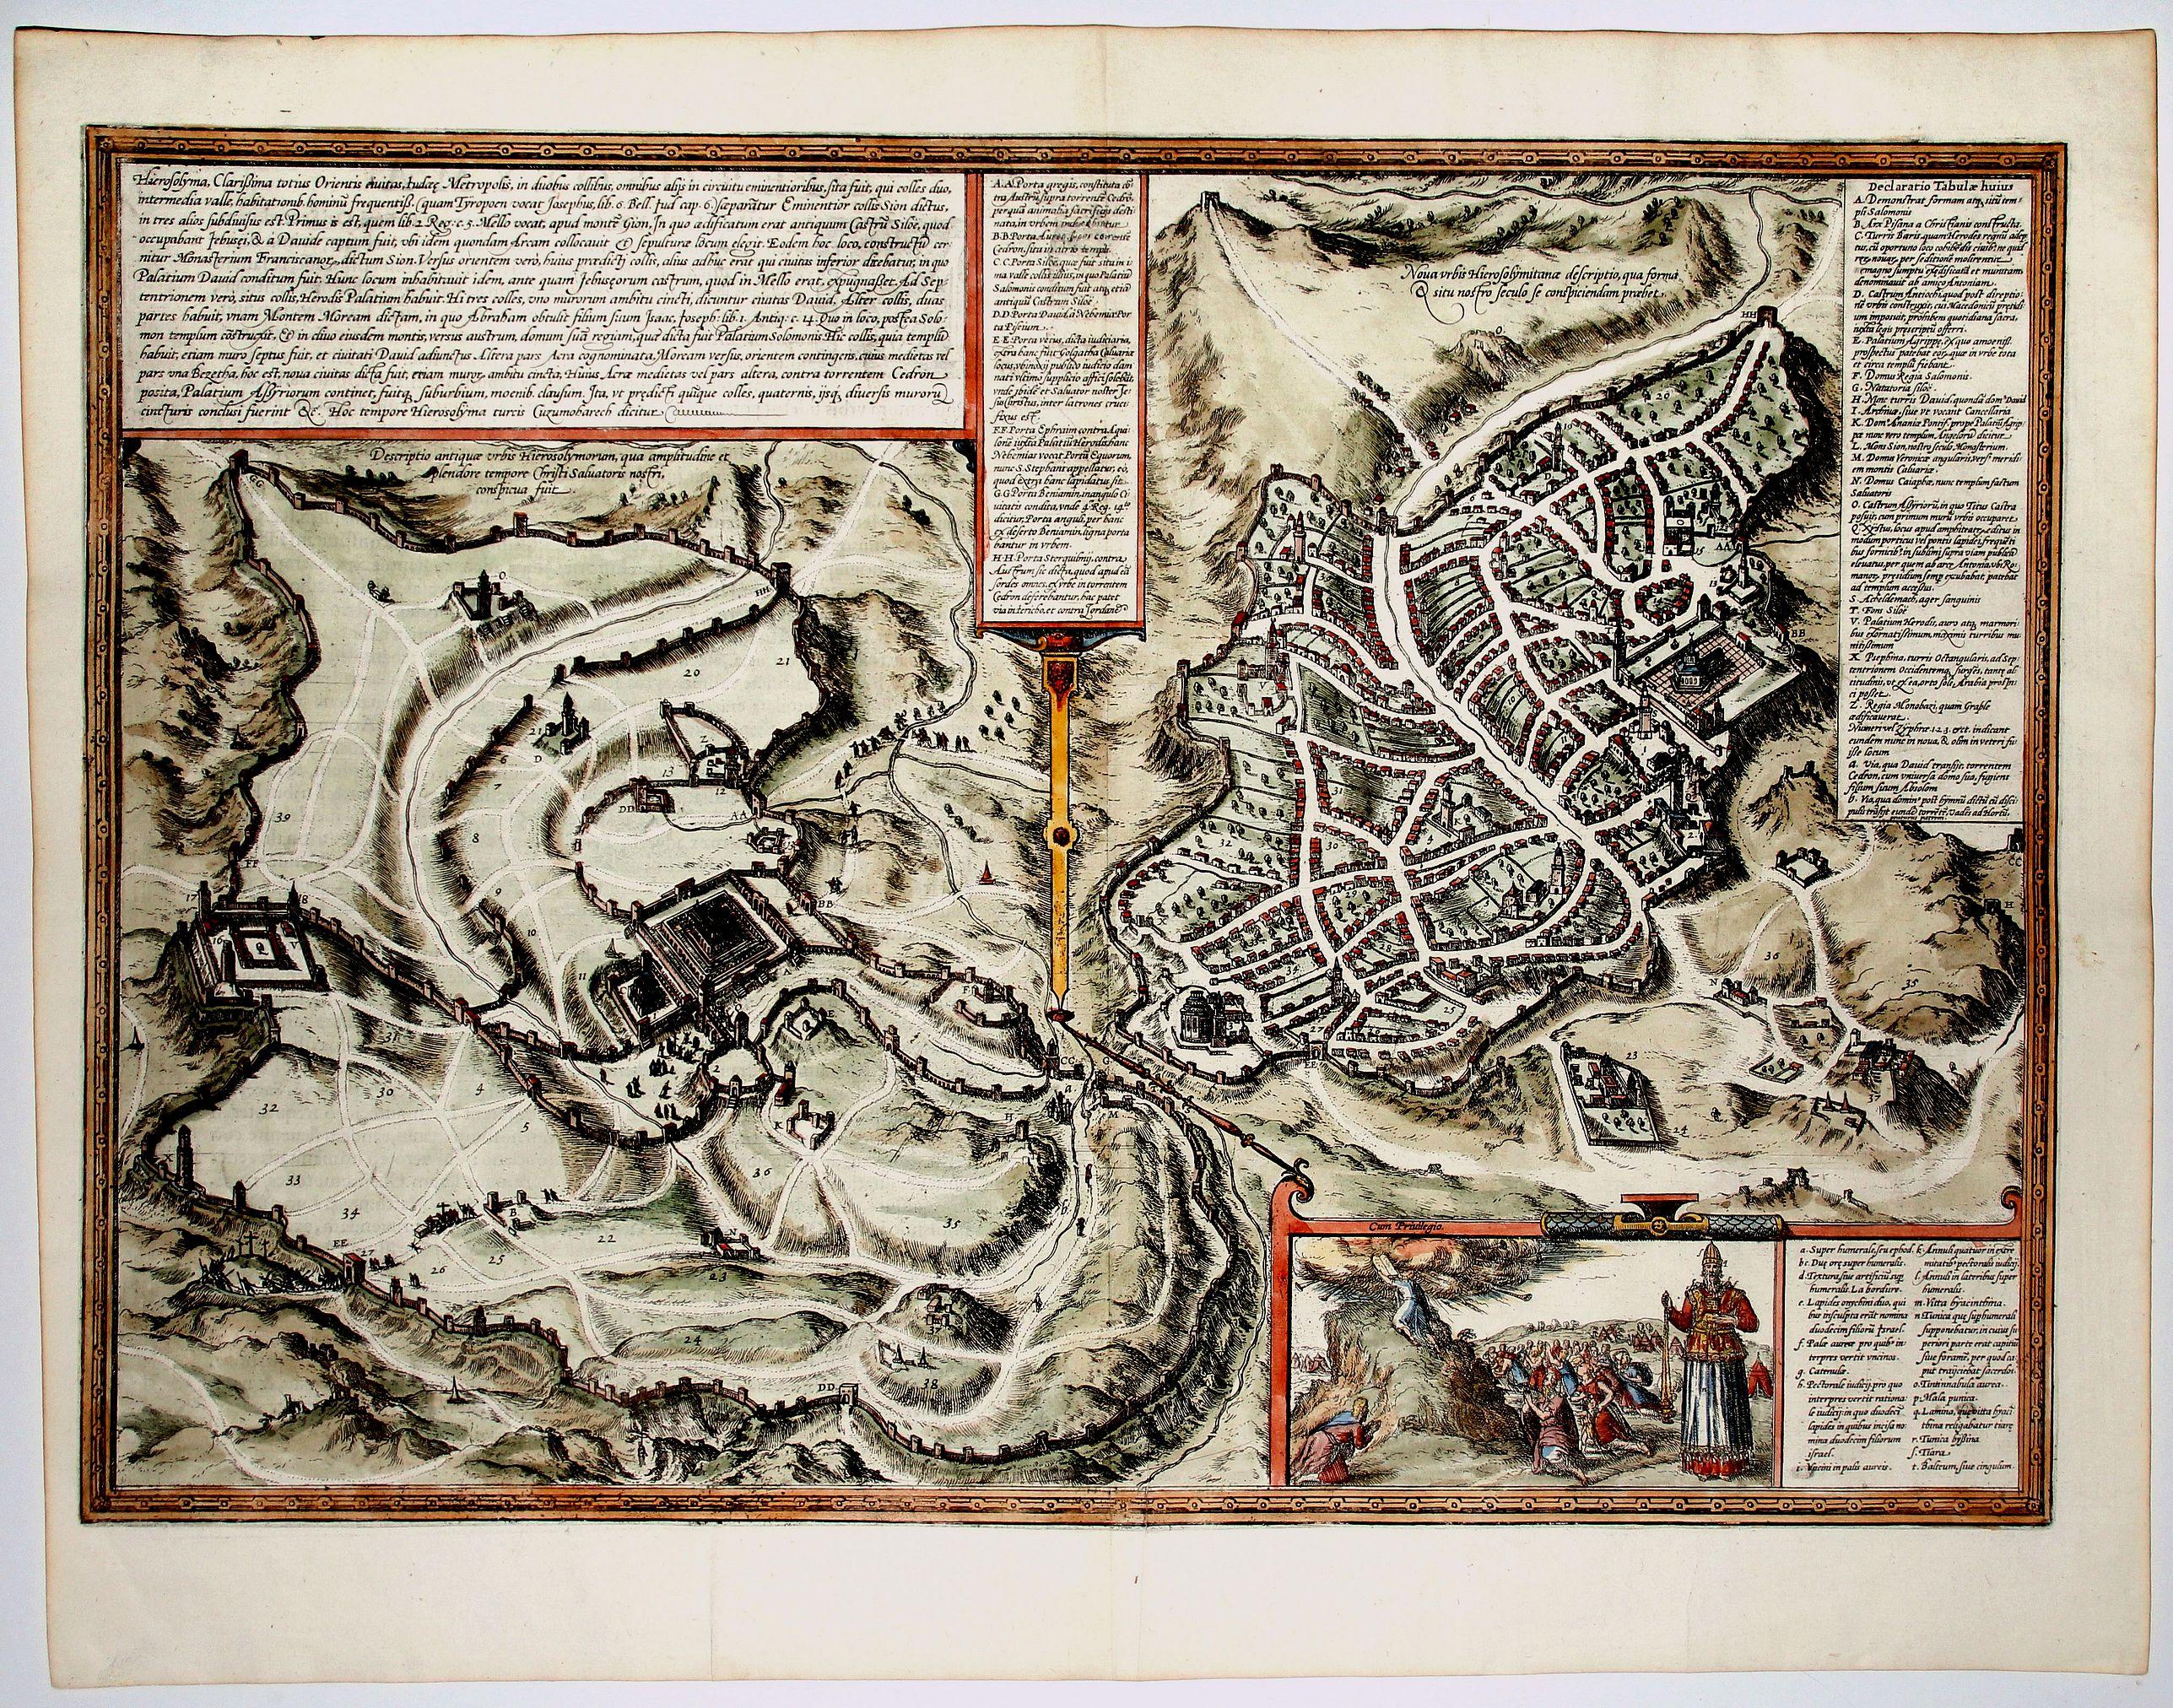 BRAUN,G. / HOGENBERG, F. - Hierosolyma, Clarrisima Totius Orientis Civitas ludaee Metropolis… (Jerusalem)